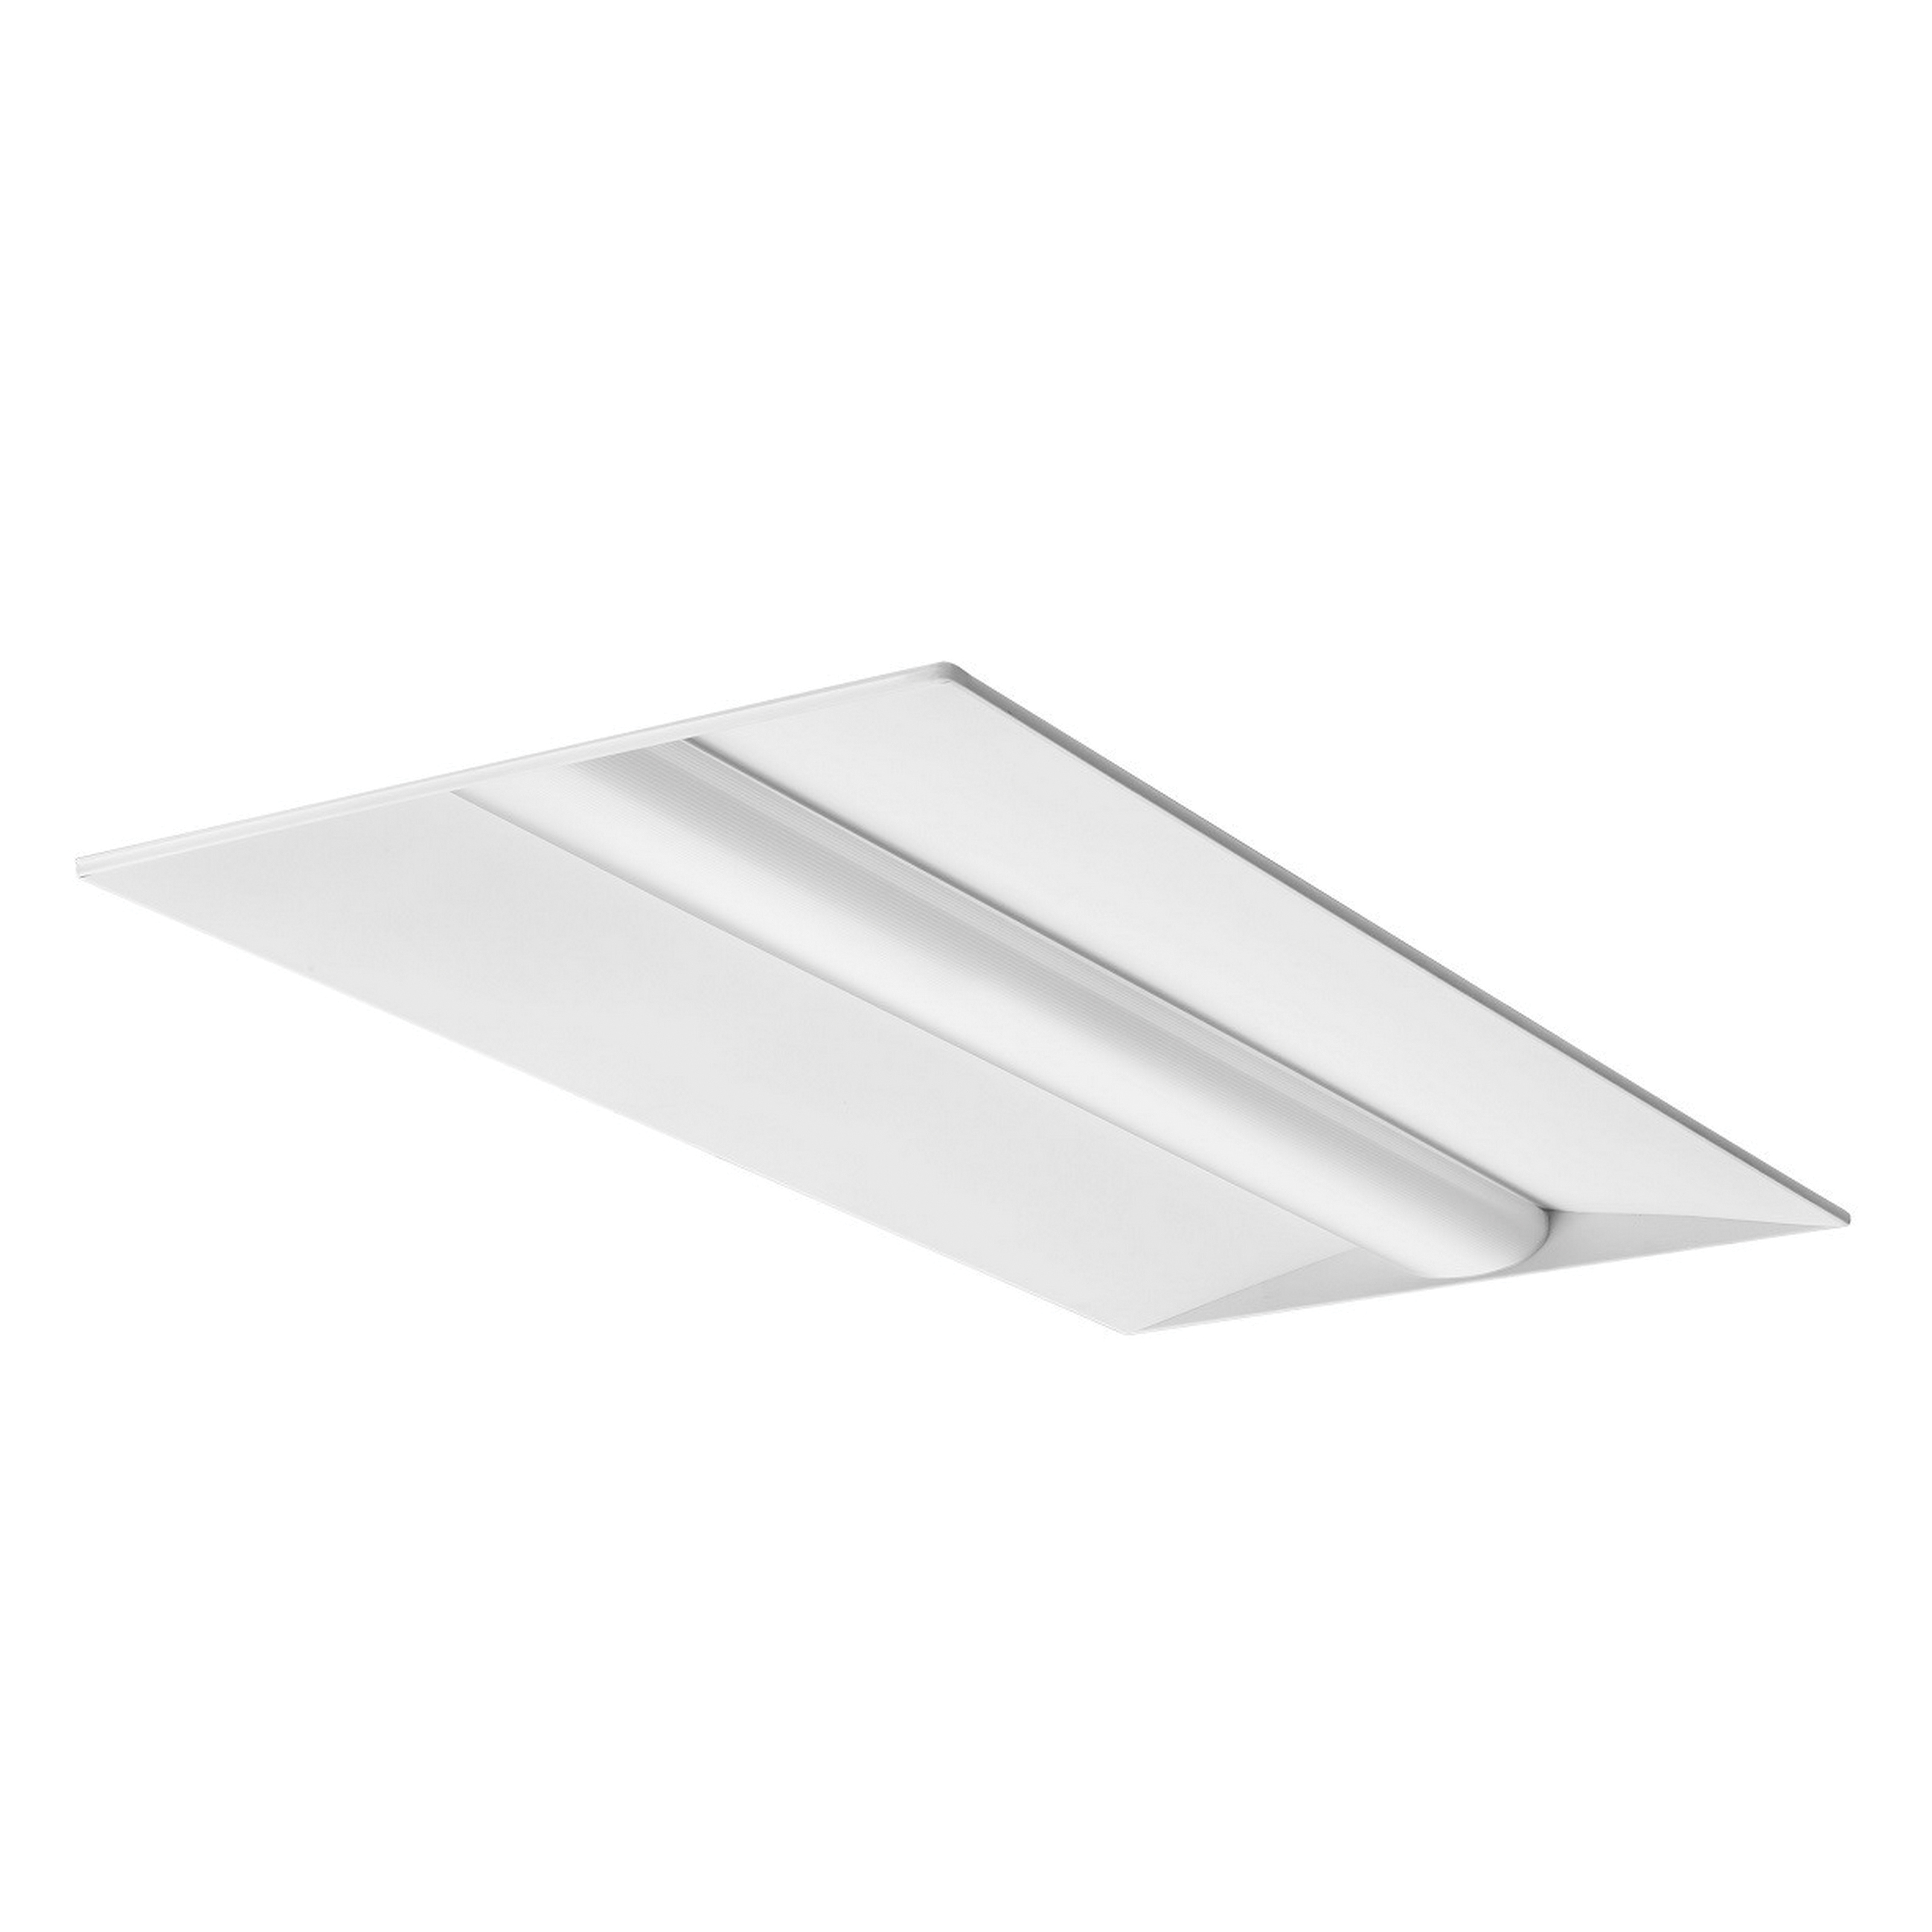 Lithonia Lighting® 2BLT4 40L ADP LP835 CP